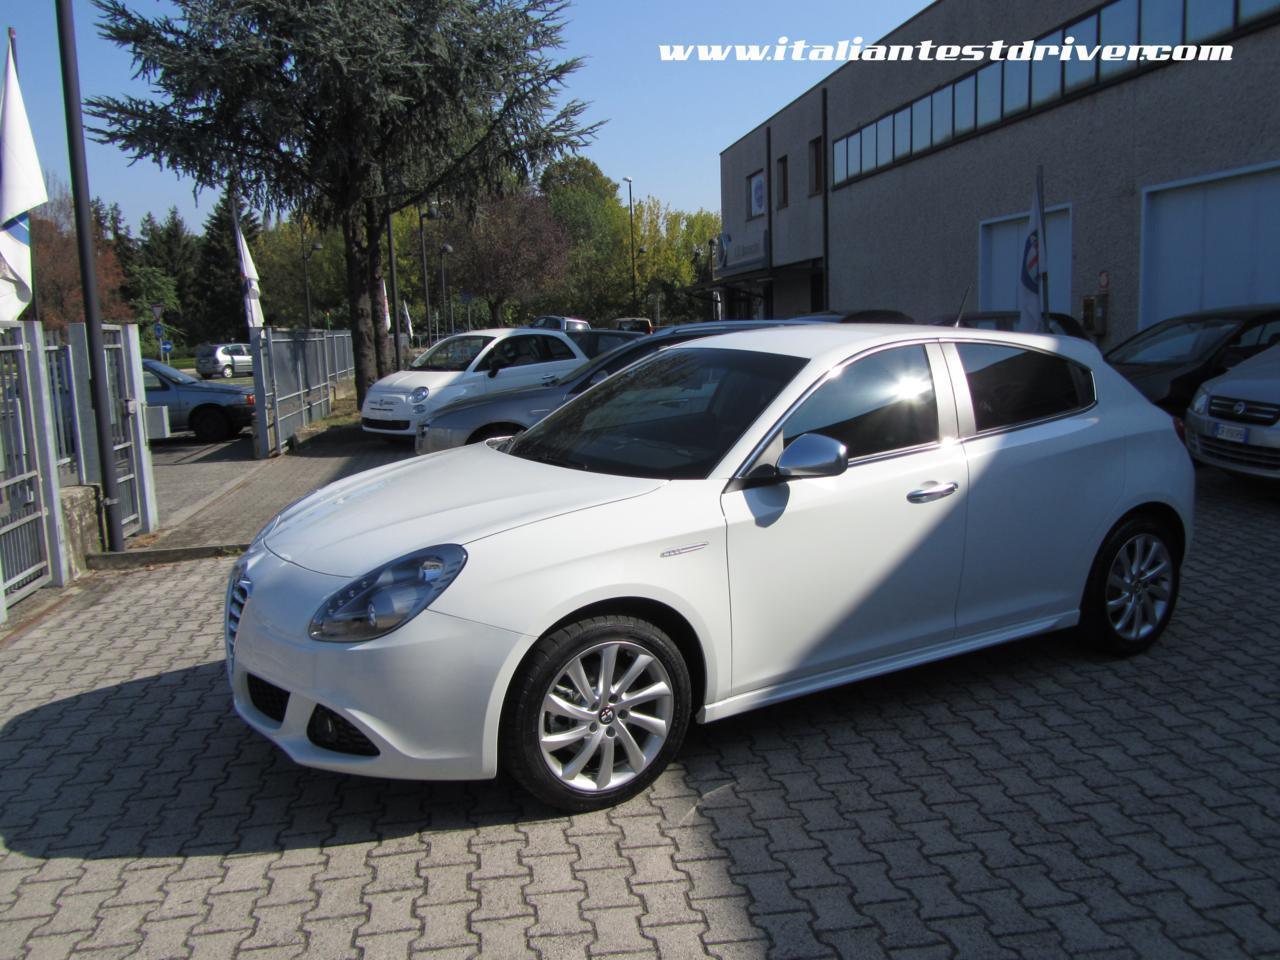 Alfa Romeo Giulietta, 1,4 M-Air 170 - dba.dk - Køb og Salg